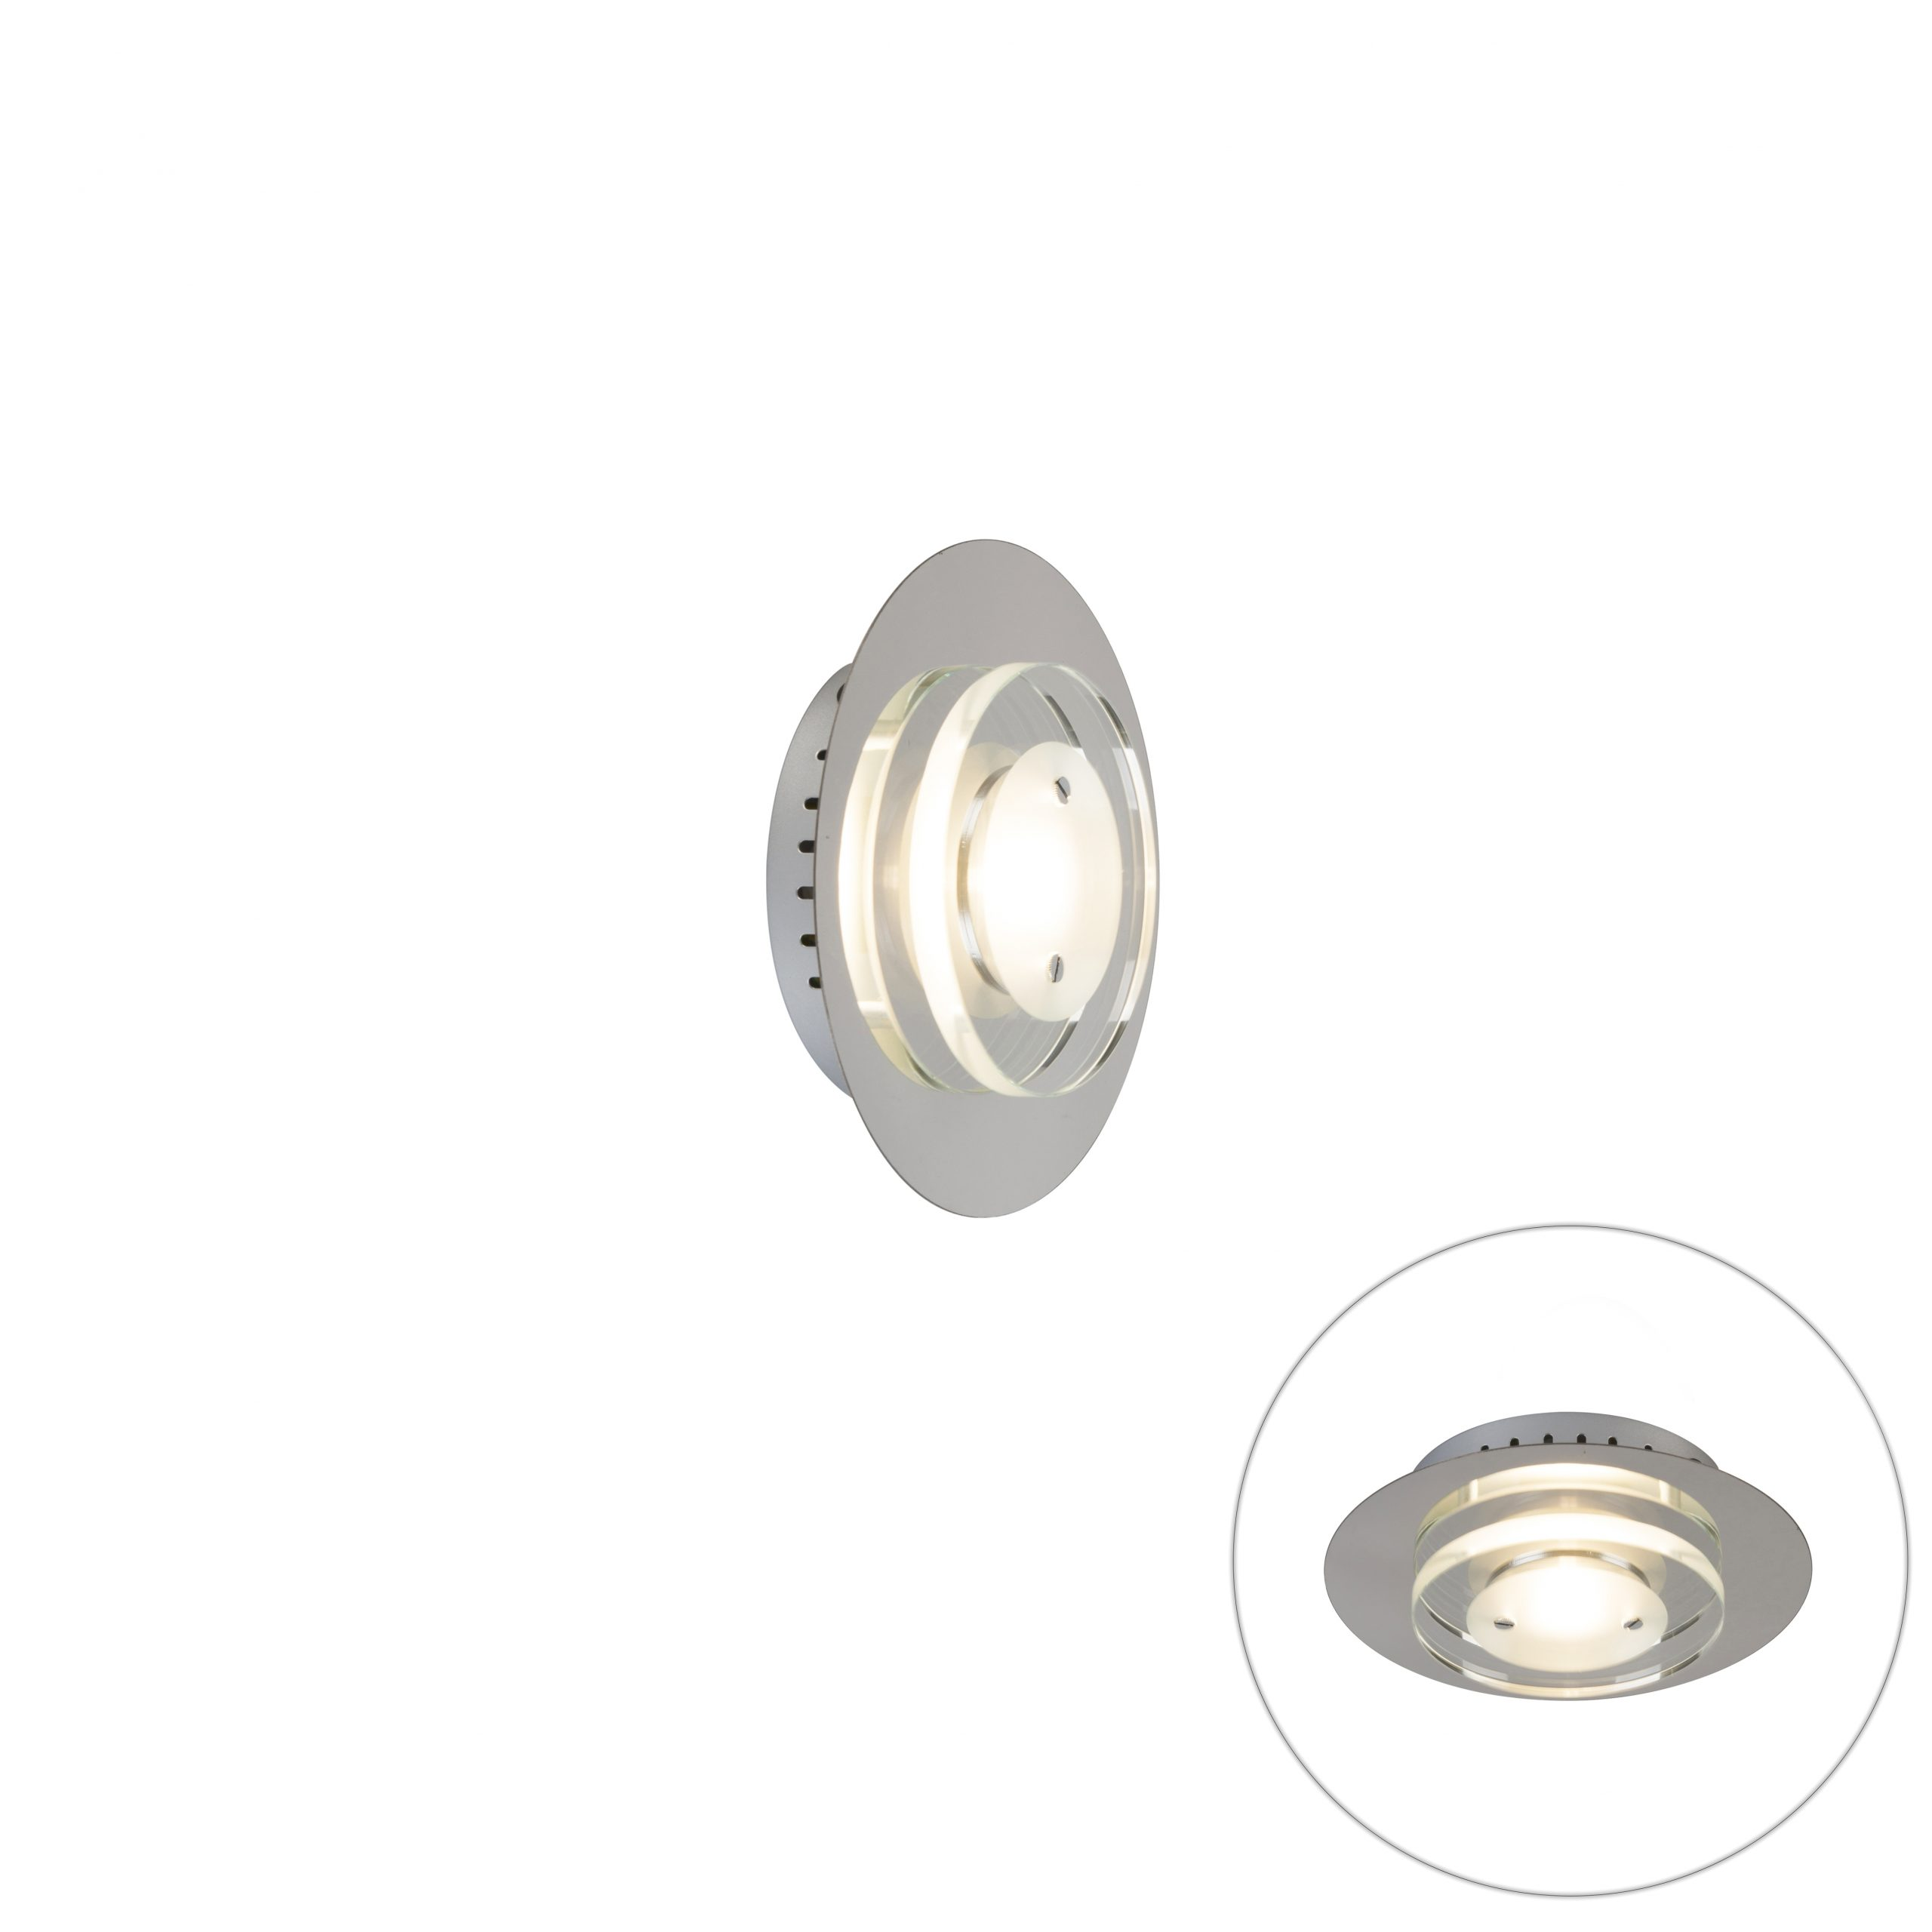 Moderne ronde plafondlamp chrome incl. LED – Alex | Trio Leuchten | 4017807261639